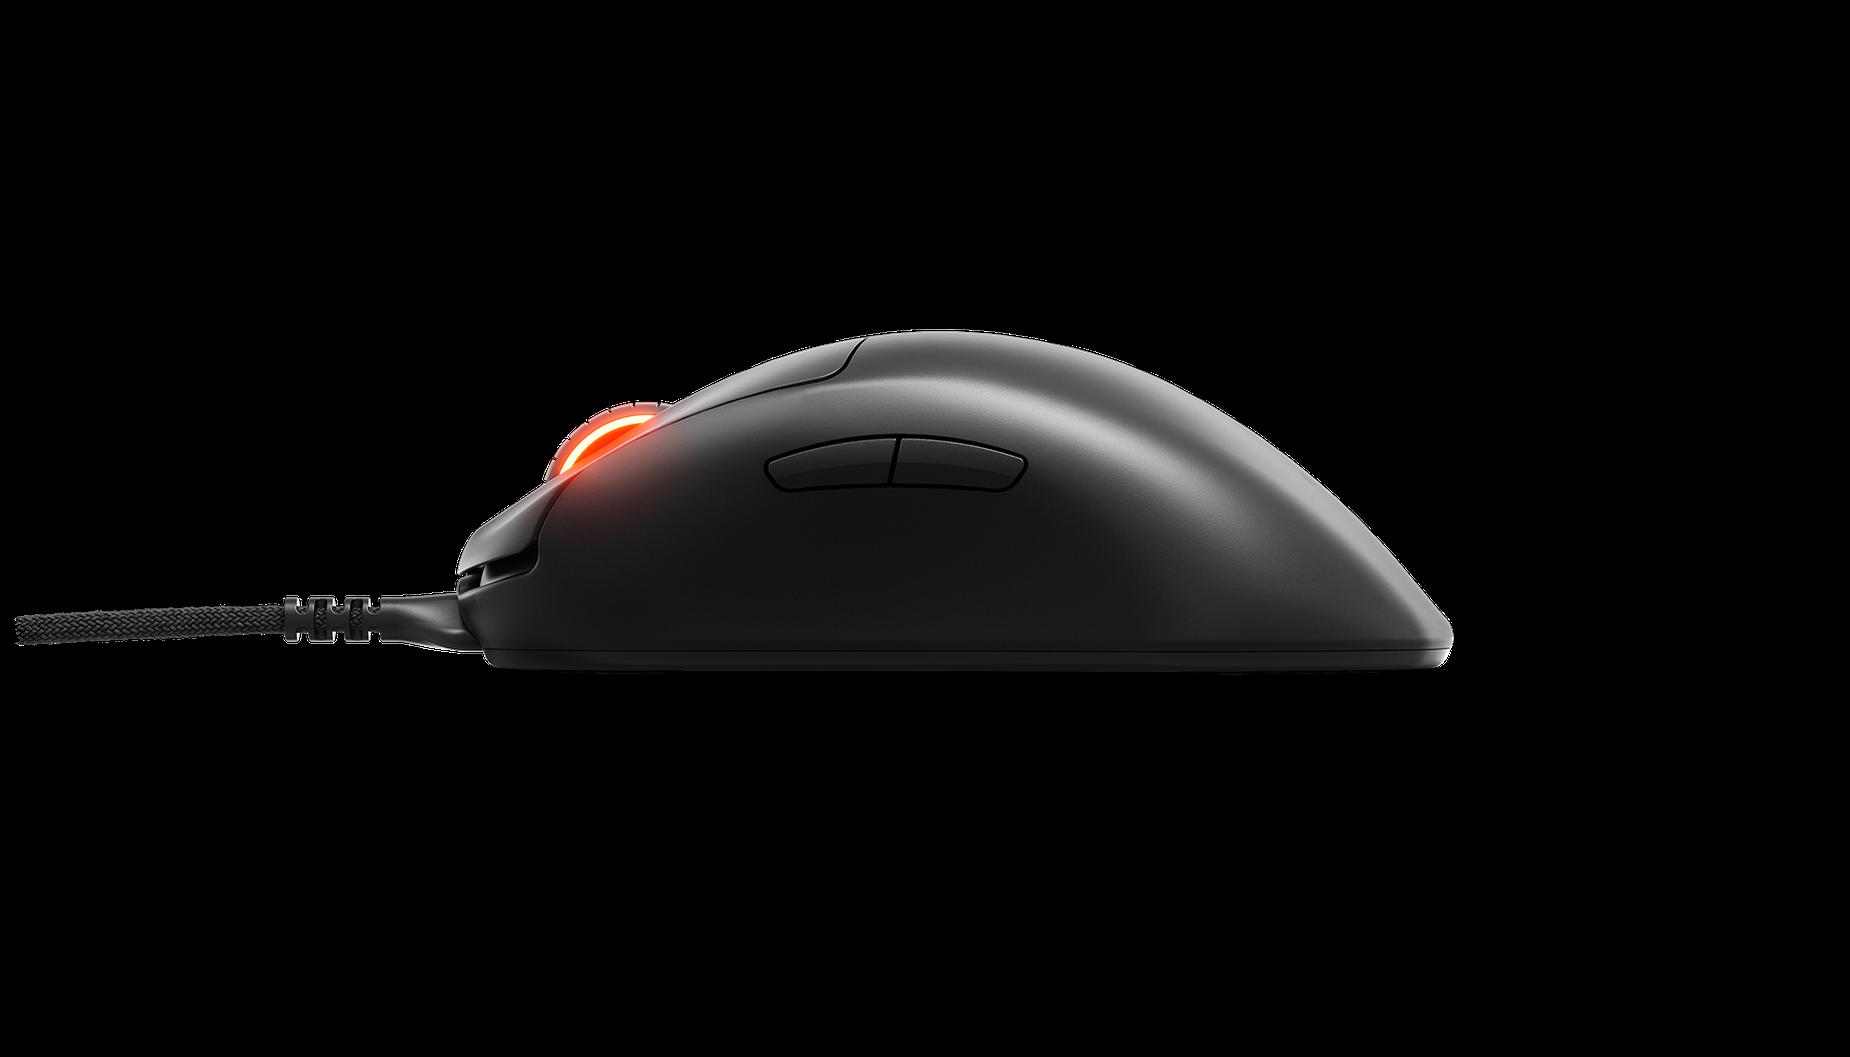 Prime 滑鼠的側視圖。